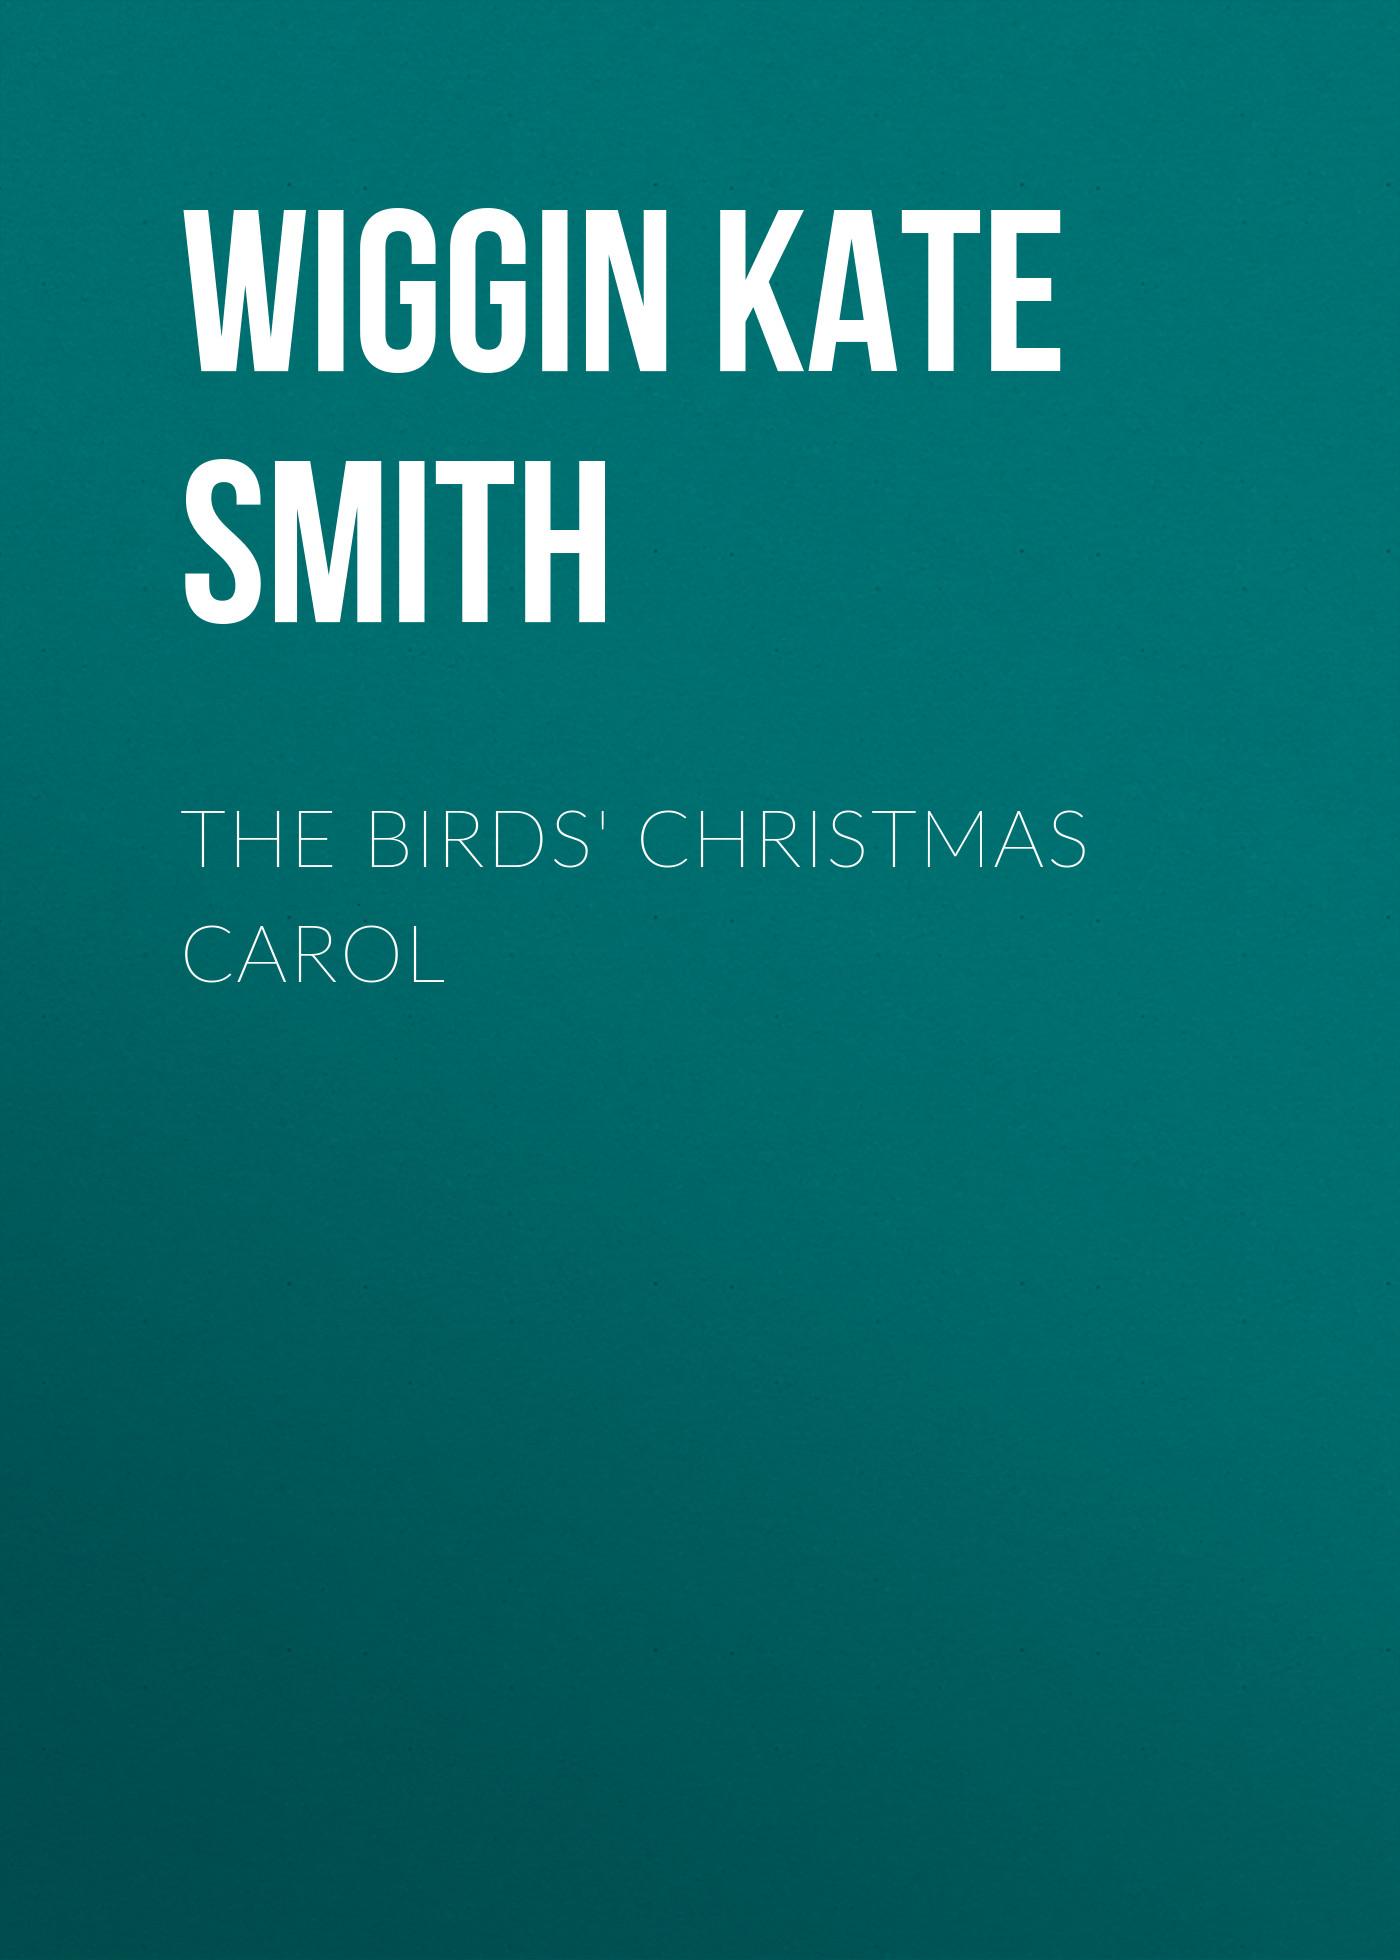 Wiggin Kate Douglas Smith The Birds' Christmas Carol wendy douglas the unlikely groom